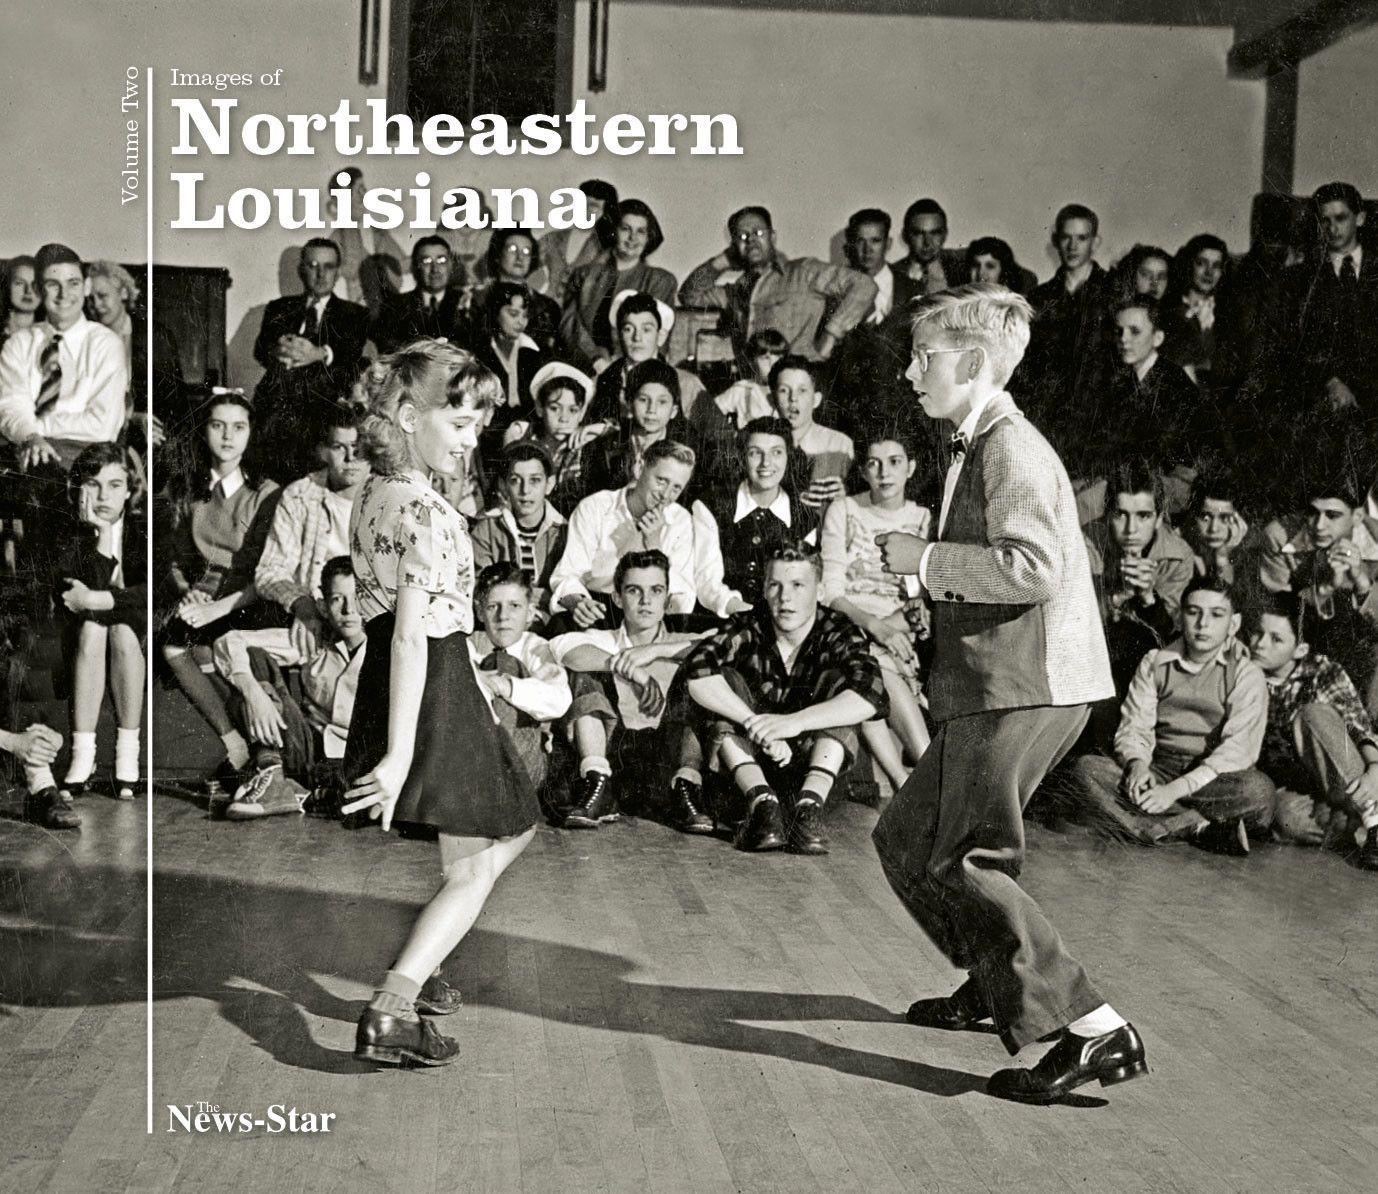 Images of Northeastern Louisiana: Volume II